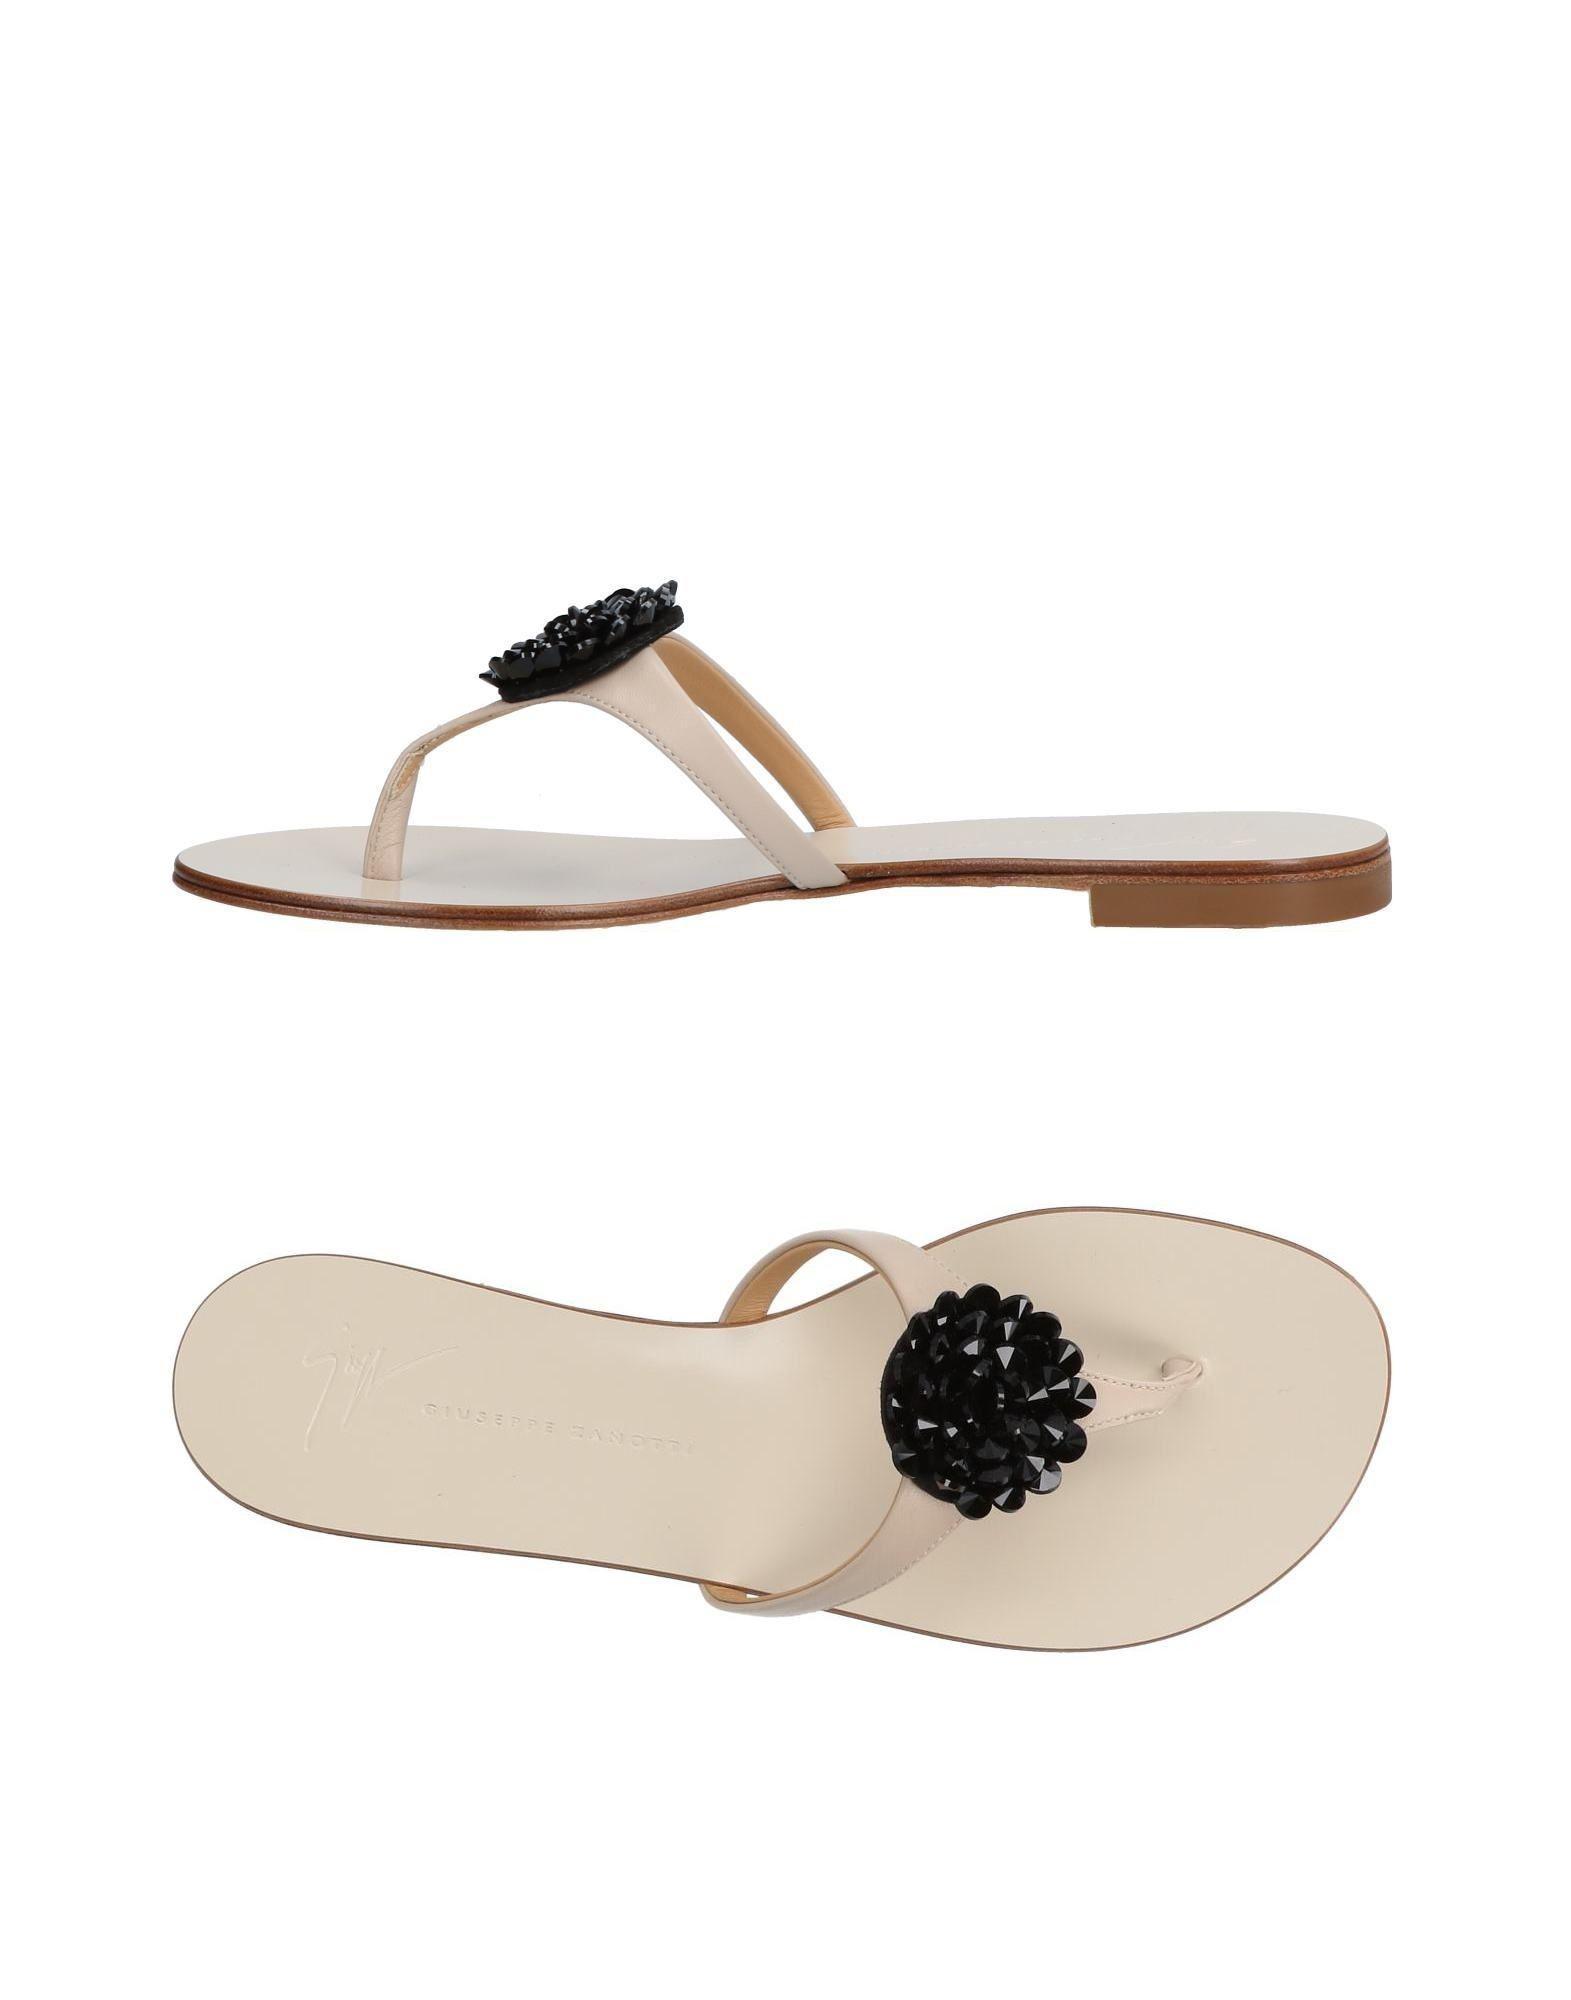 Cheap Best Wholesale Red Pre Order Eastbay FOOTWEAR - Toe post sandals Giuseppe Zanotti Free Shipping Choice Best For Sale ZQSJGV